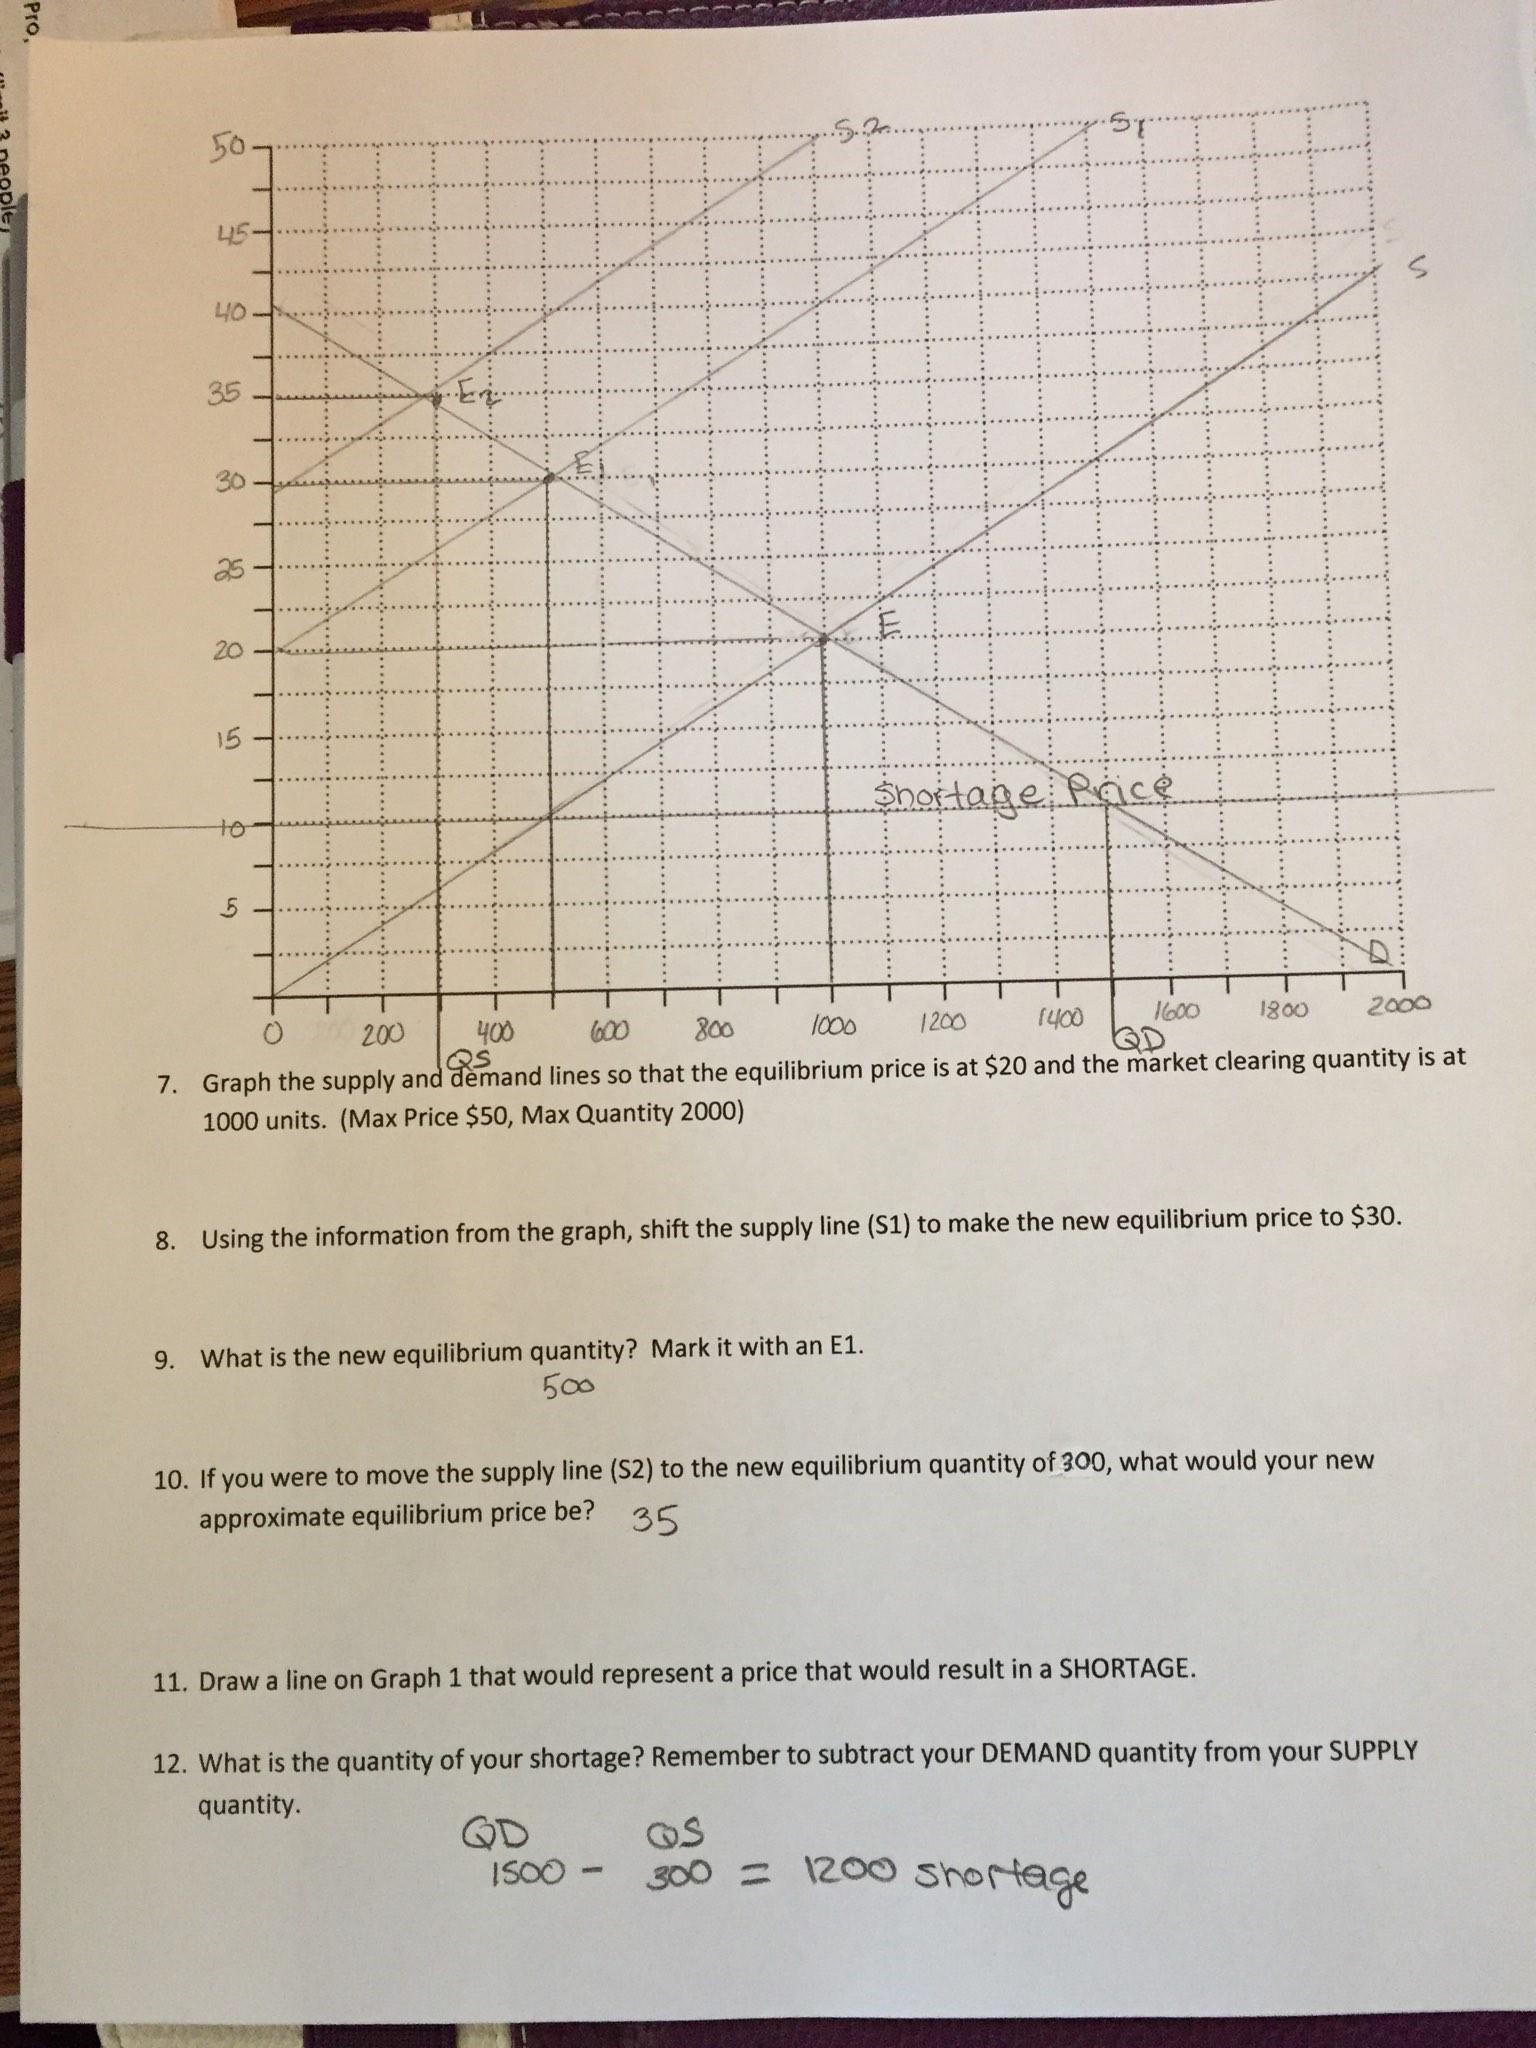 worksheet Freakonomics Movie Worksheet armani brenda social science what we did in economics class worksheet key1 key 2